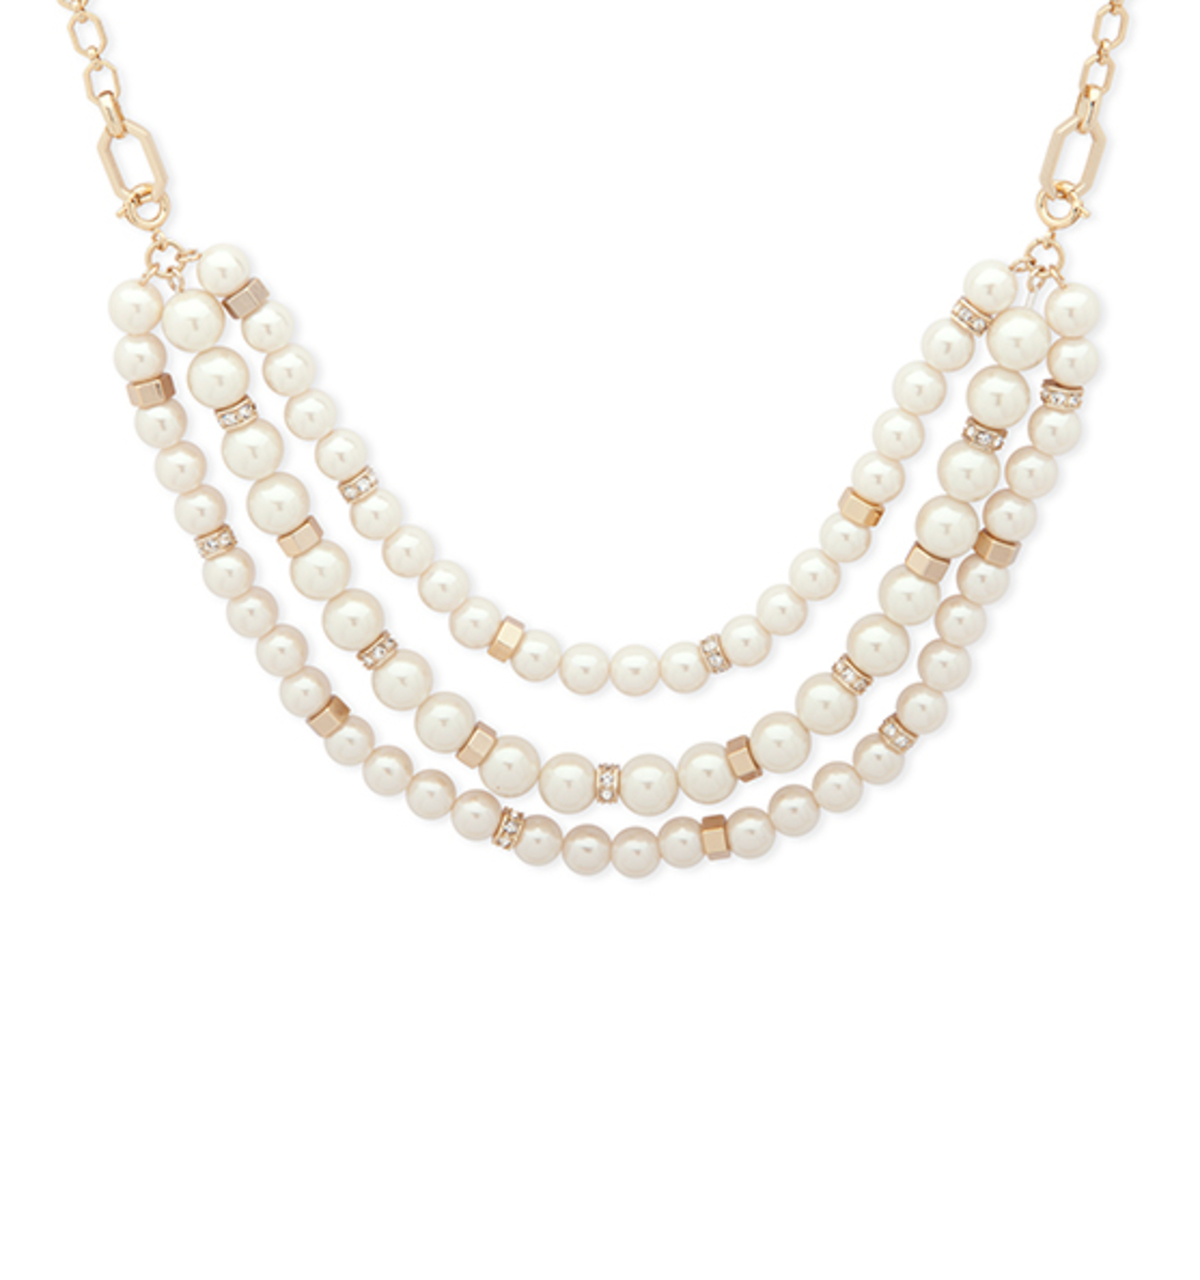 Adjustable multi row necklace